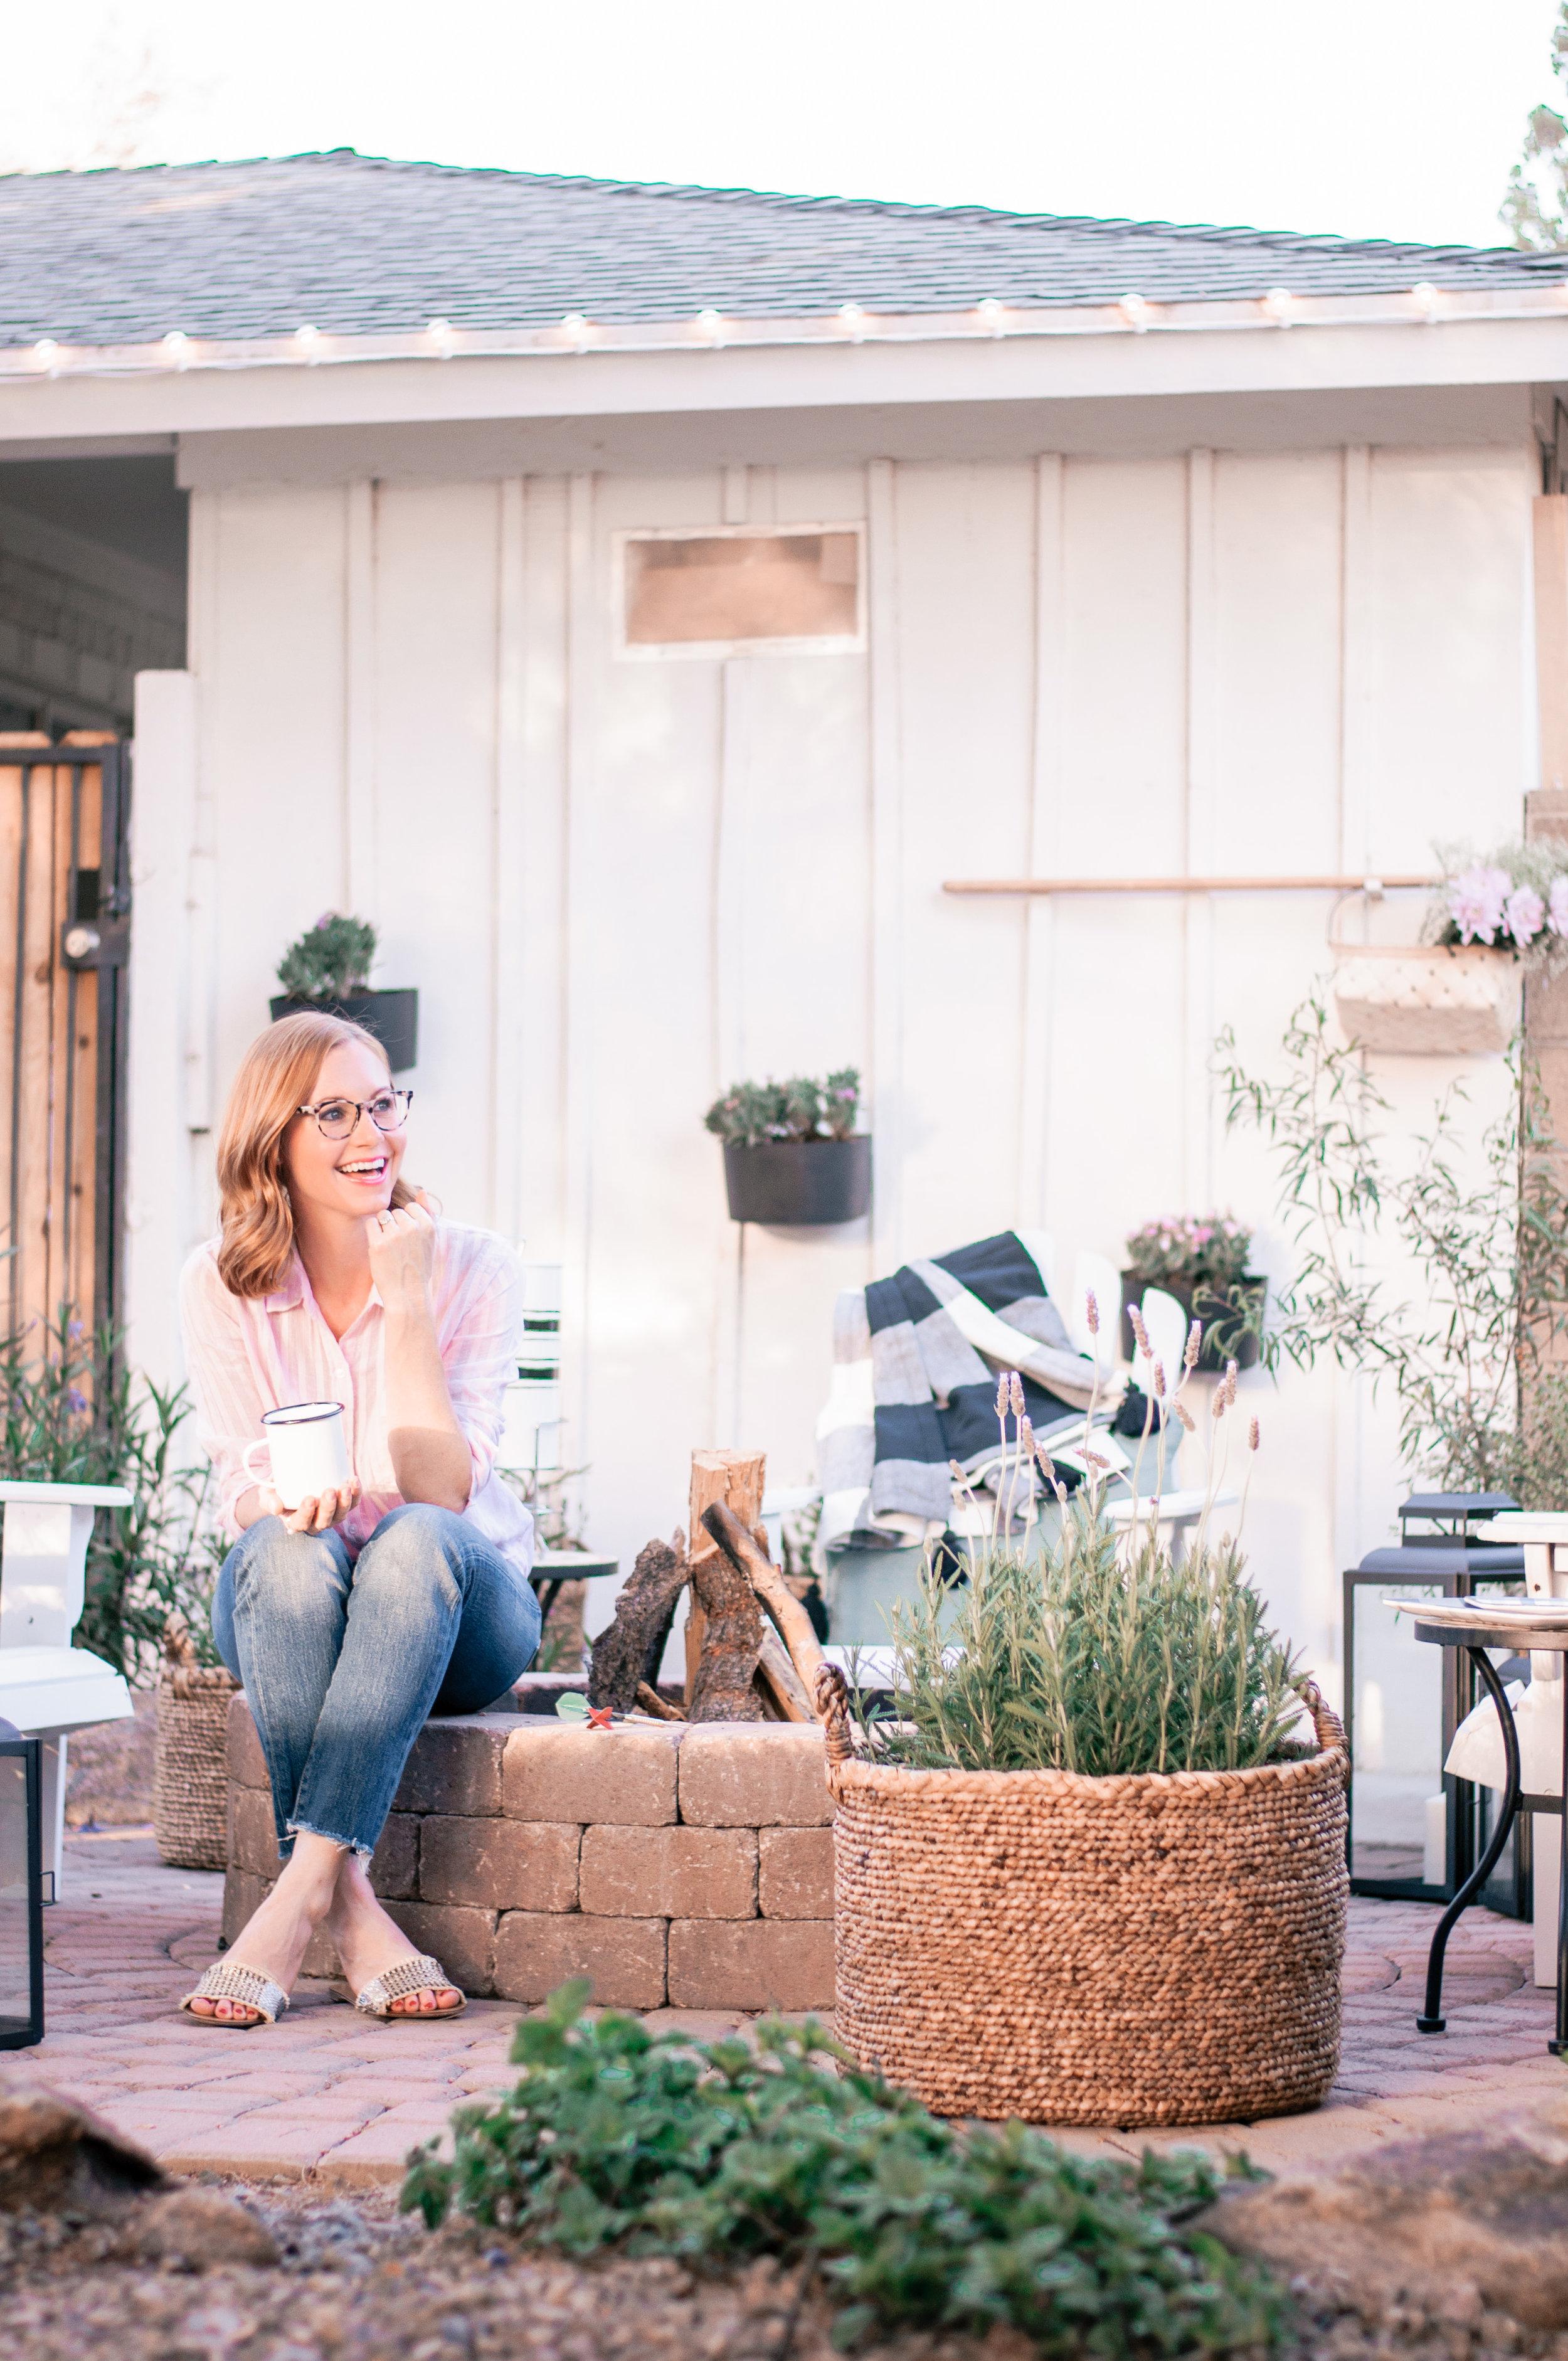 DIY Backyard Brick Fireplace Design Ideas